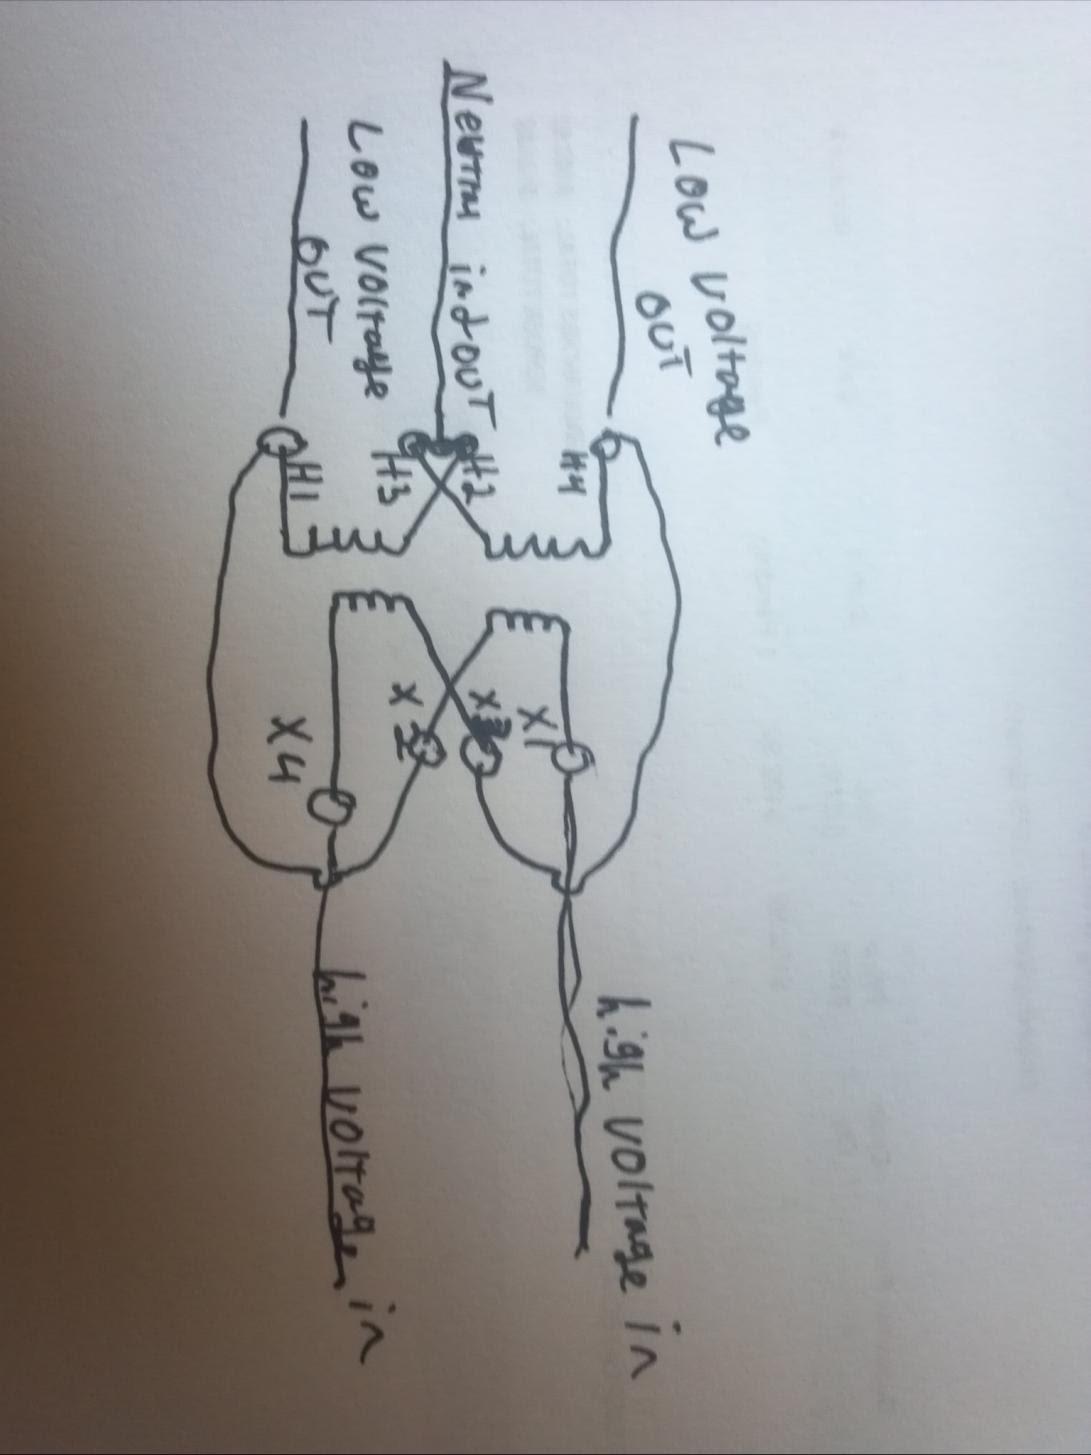 Diagram Leds And Transformer Wiring Diagram Full Version Hd Quality Wiring Diagram Roguediagram Gevim Fr